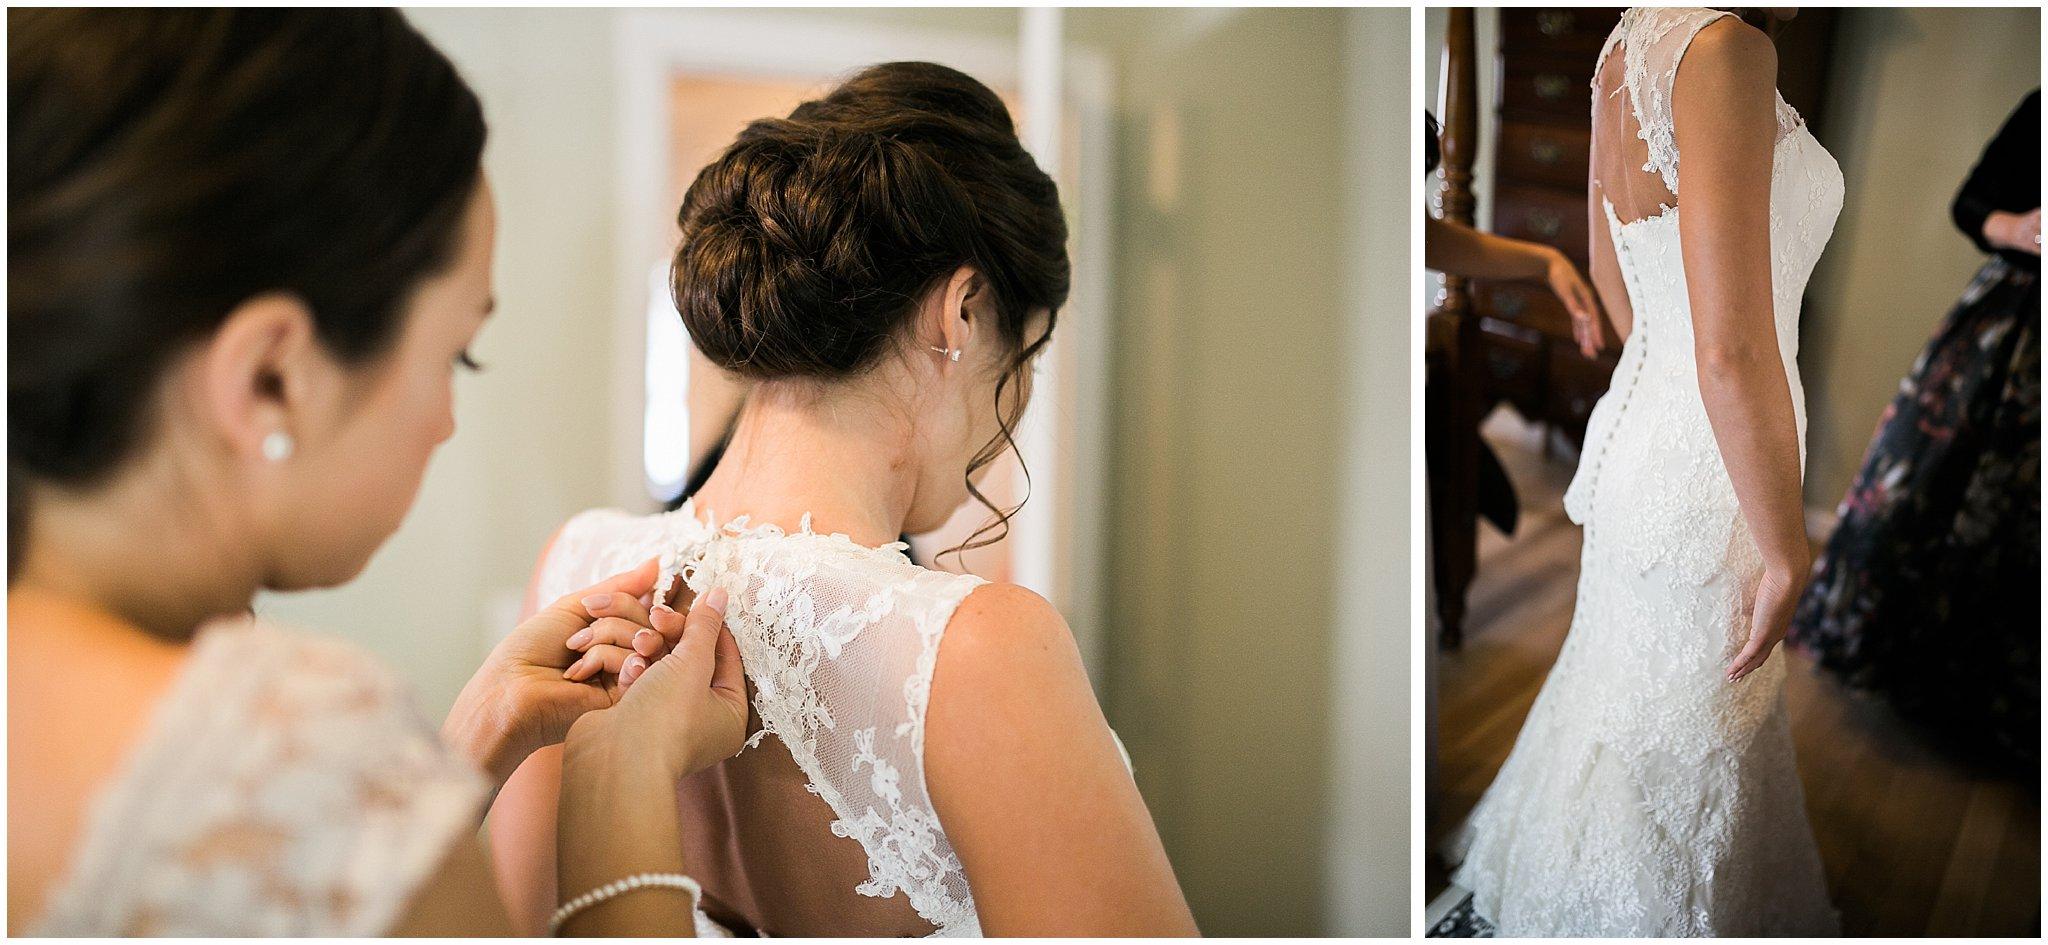 Seaport Hotel Wedding Boston Photographer Sweet Alice15.jpg